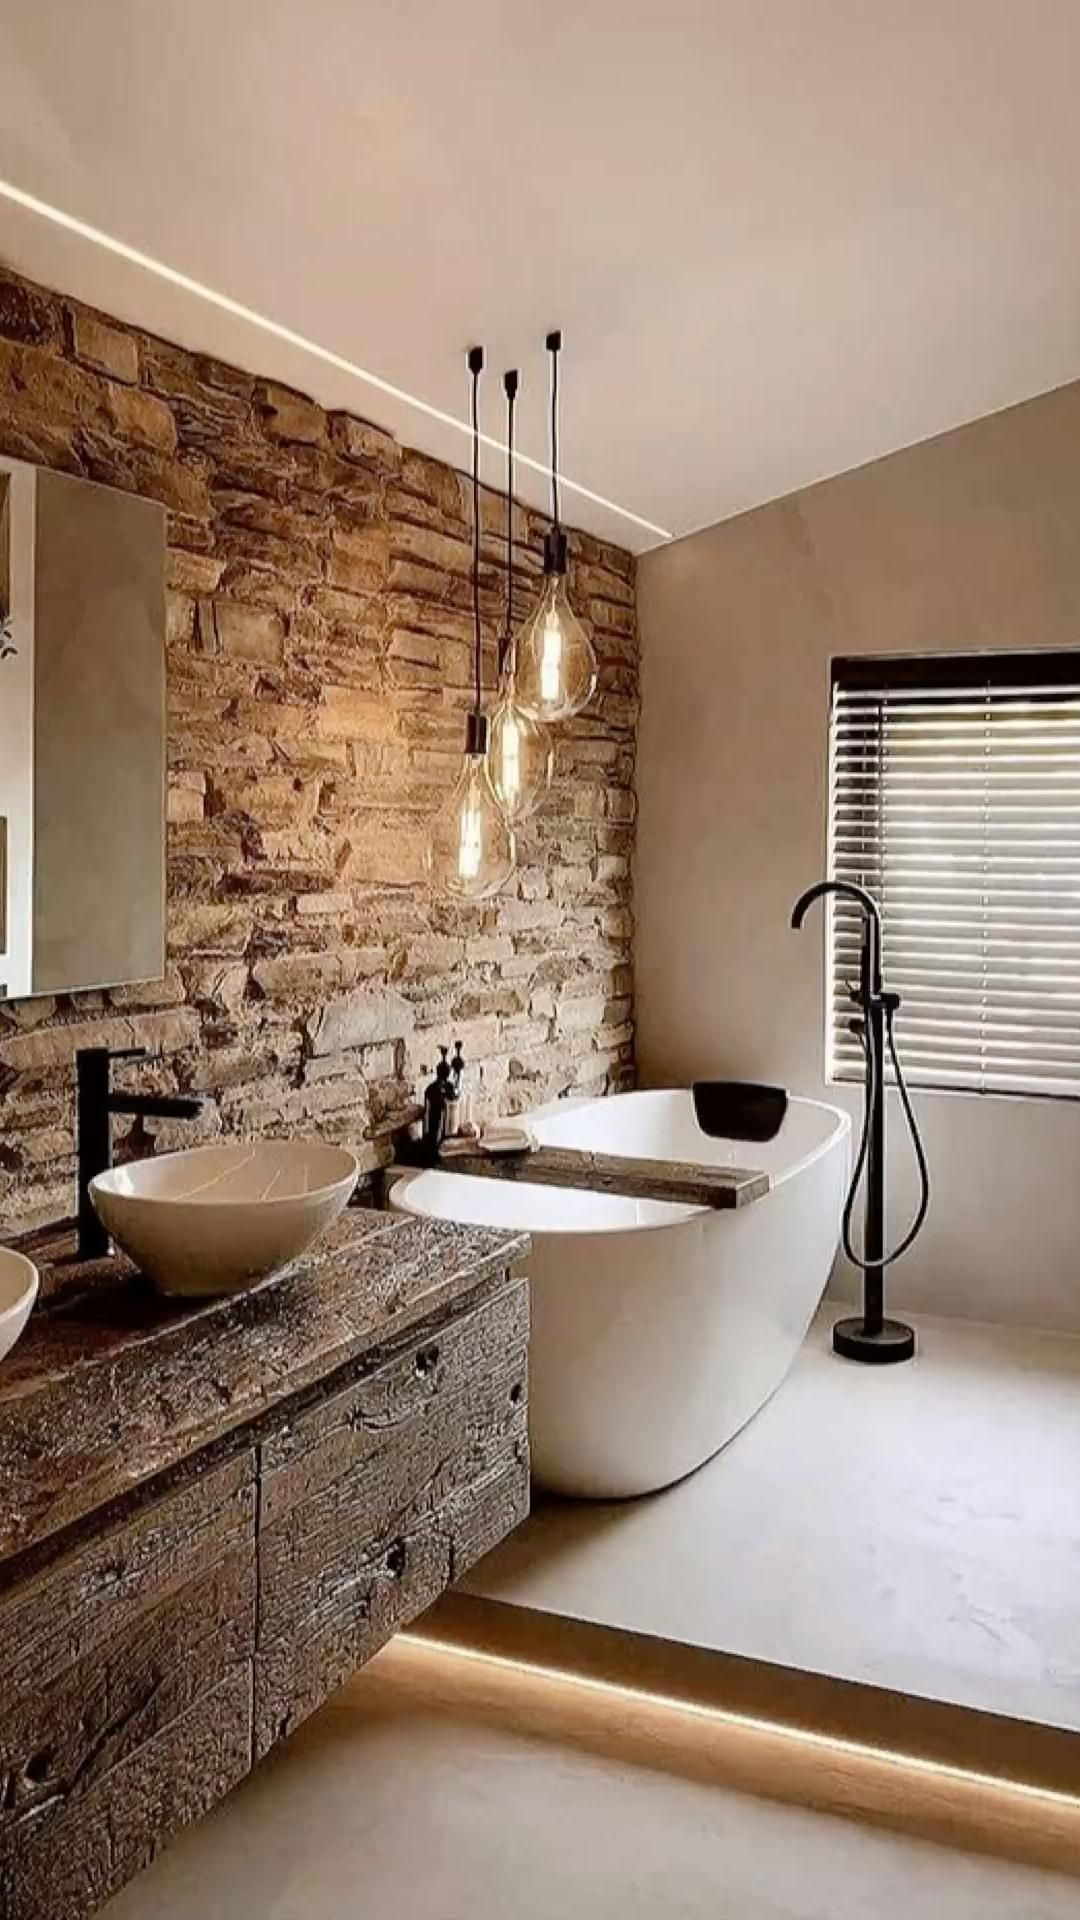 101+ Trendy bathroom Which one do you prefer